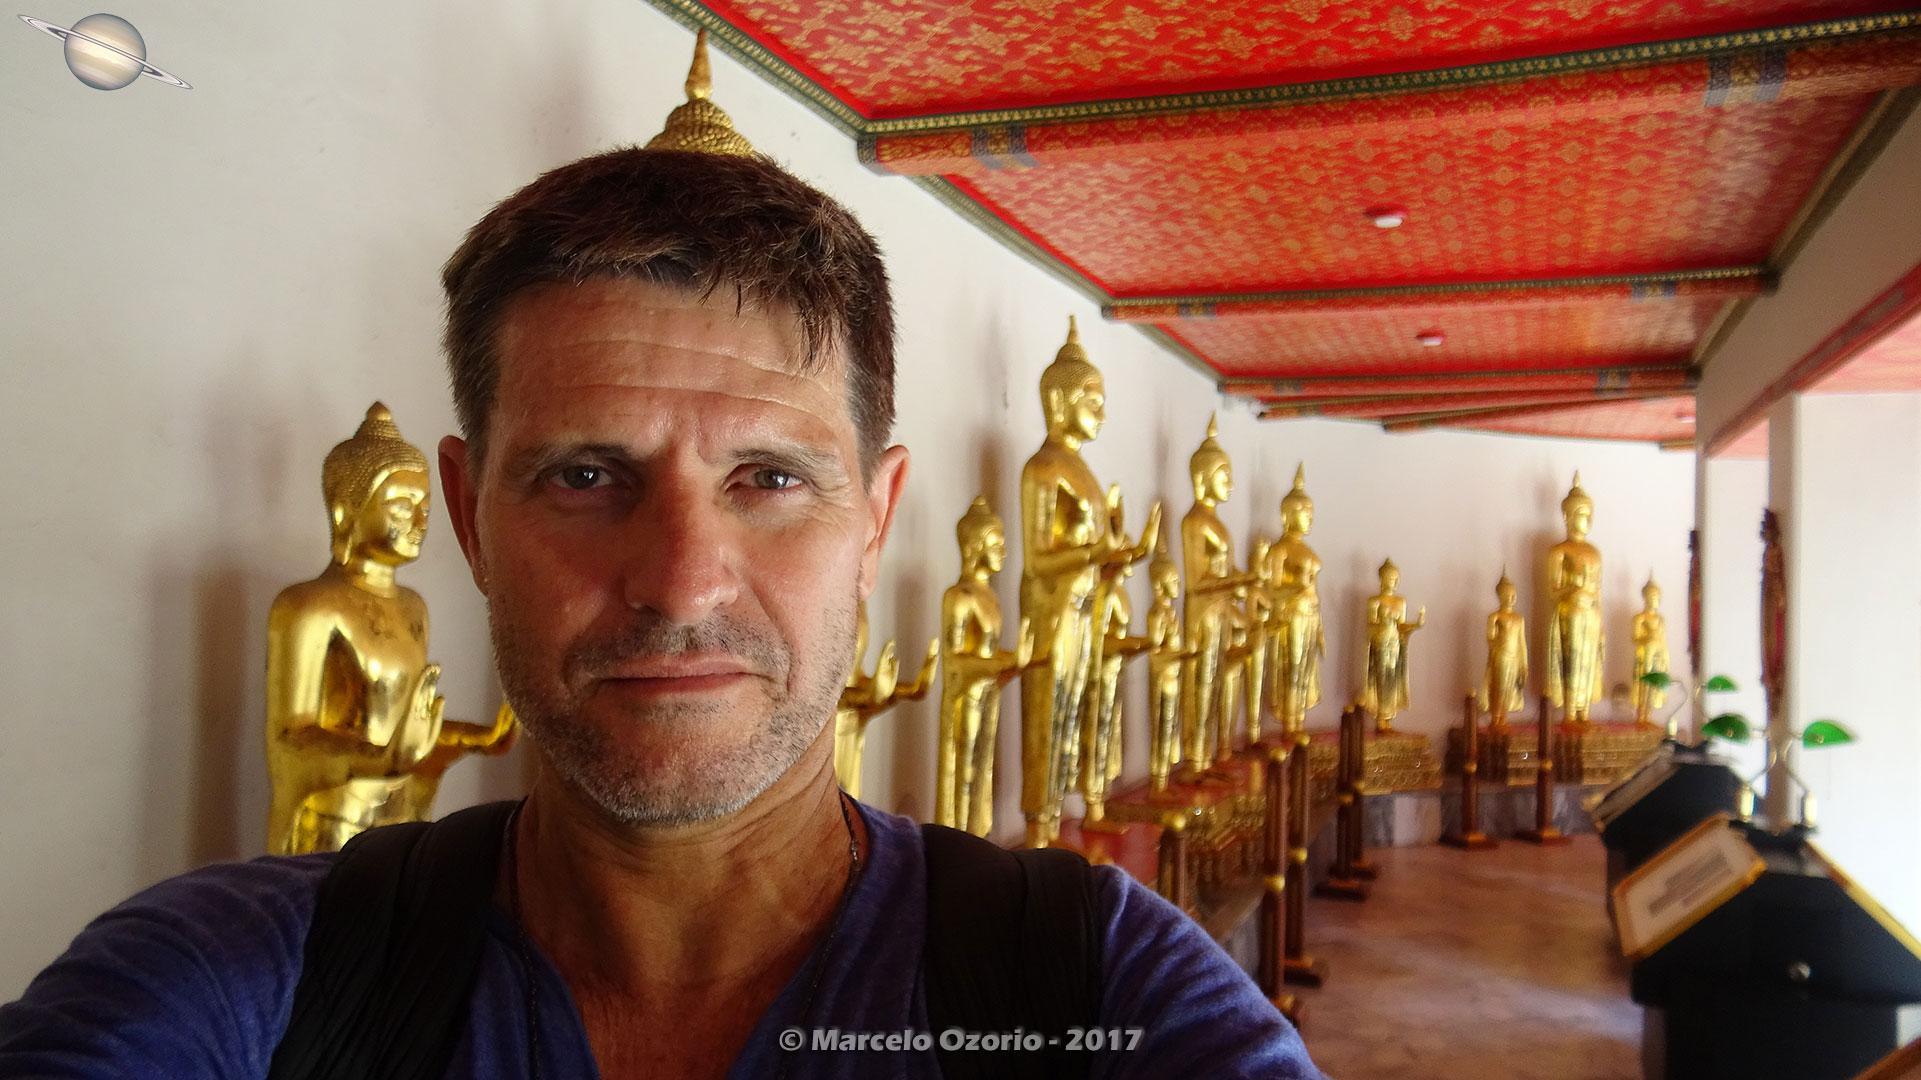 Marcelo Ozorio no Templo Wat Pho - Bangkok - Tailandia